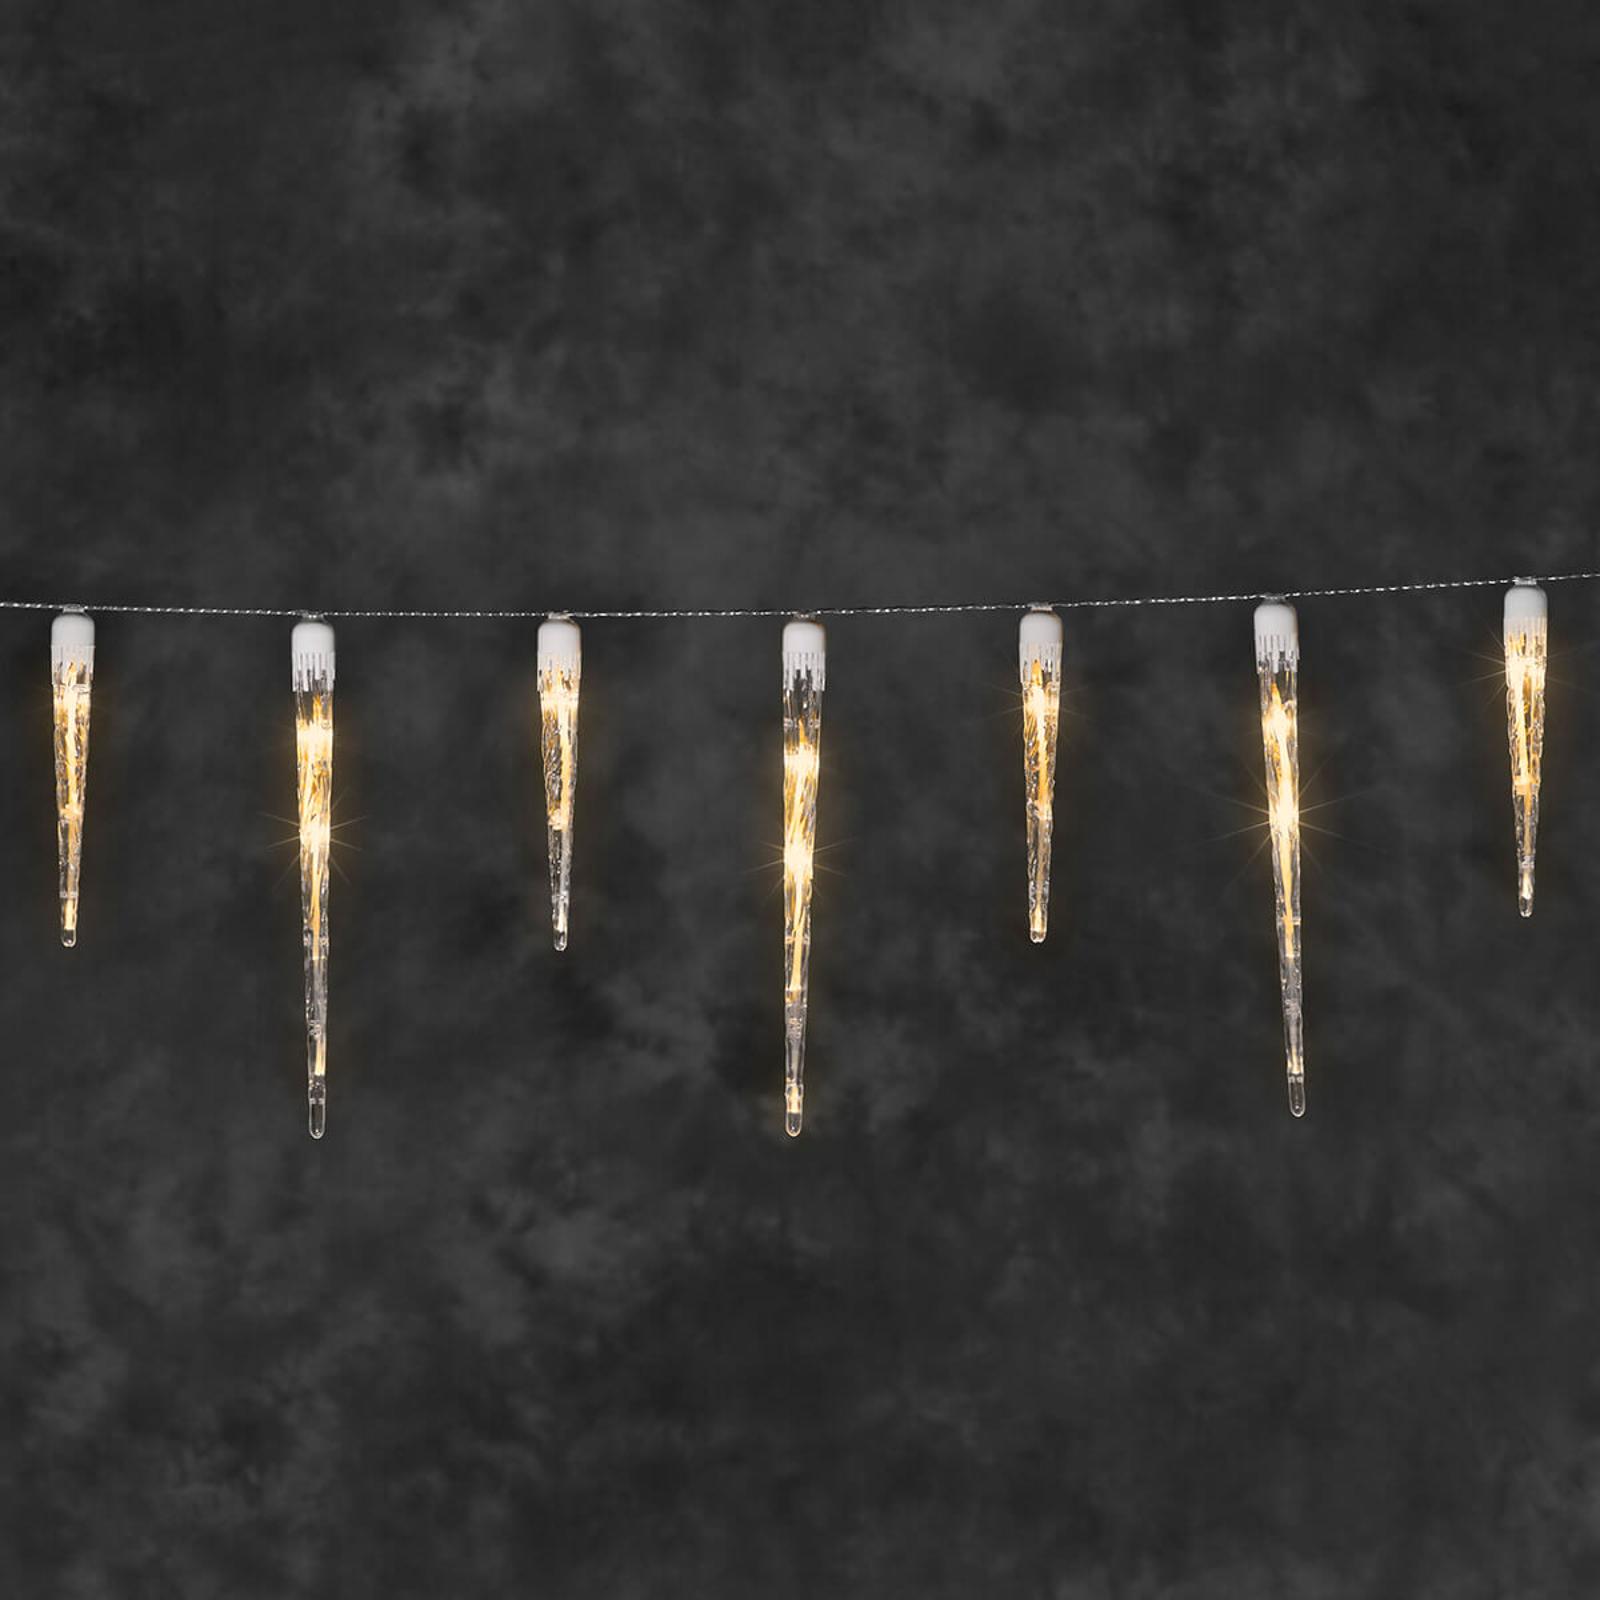 Istapp ljusslinga LED för utomhusbruk